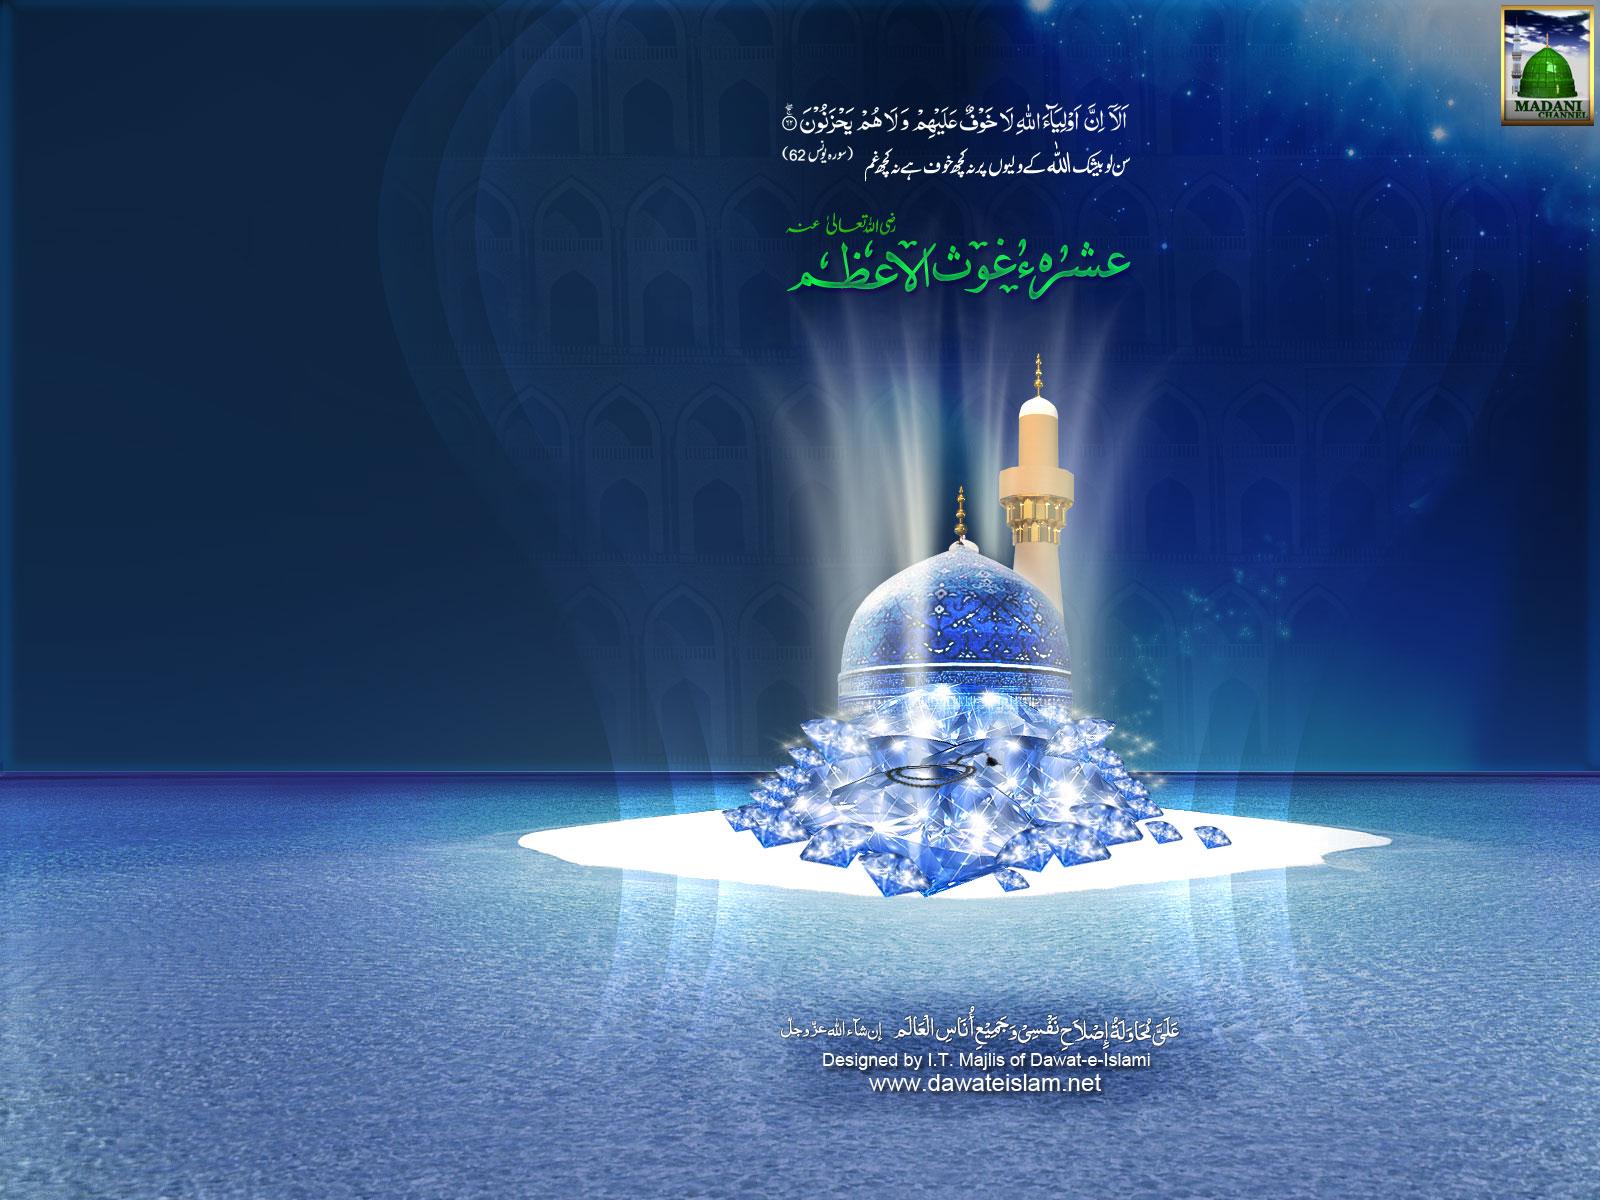 1 Wallpaper: Wallpaper Islam: Wallpaper Islami 054 Pemandangan Masjid